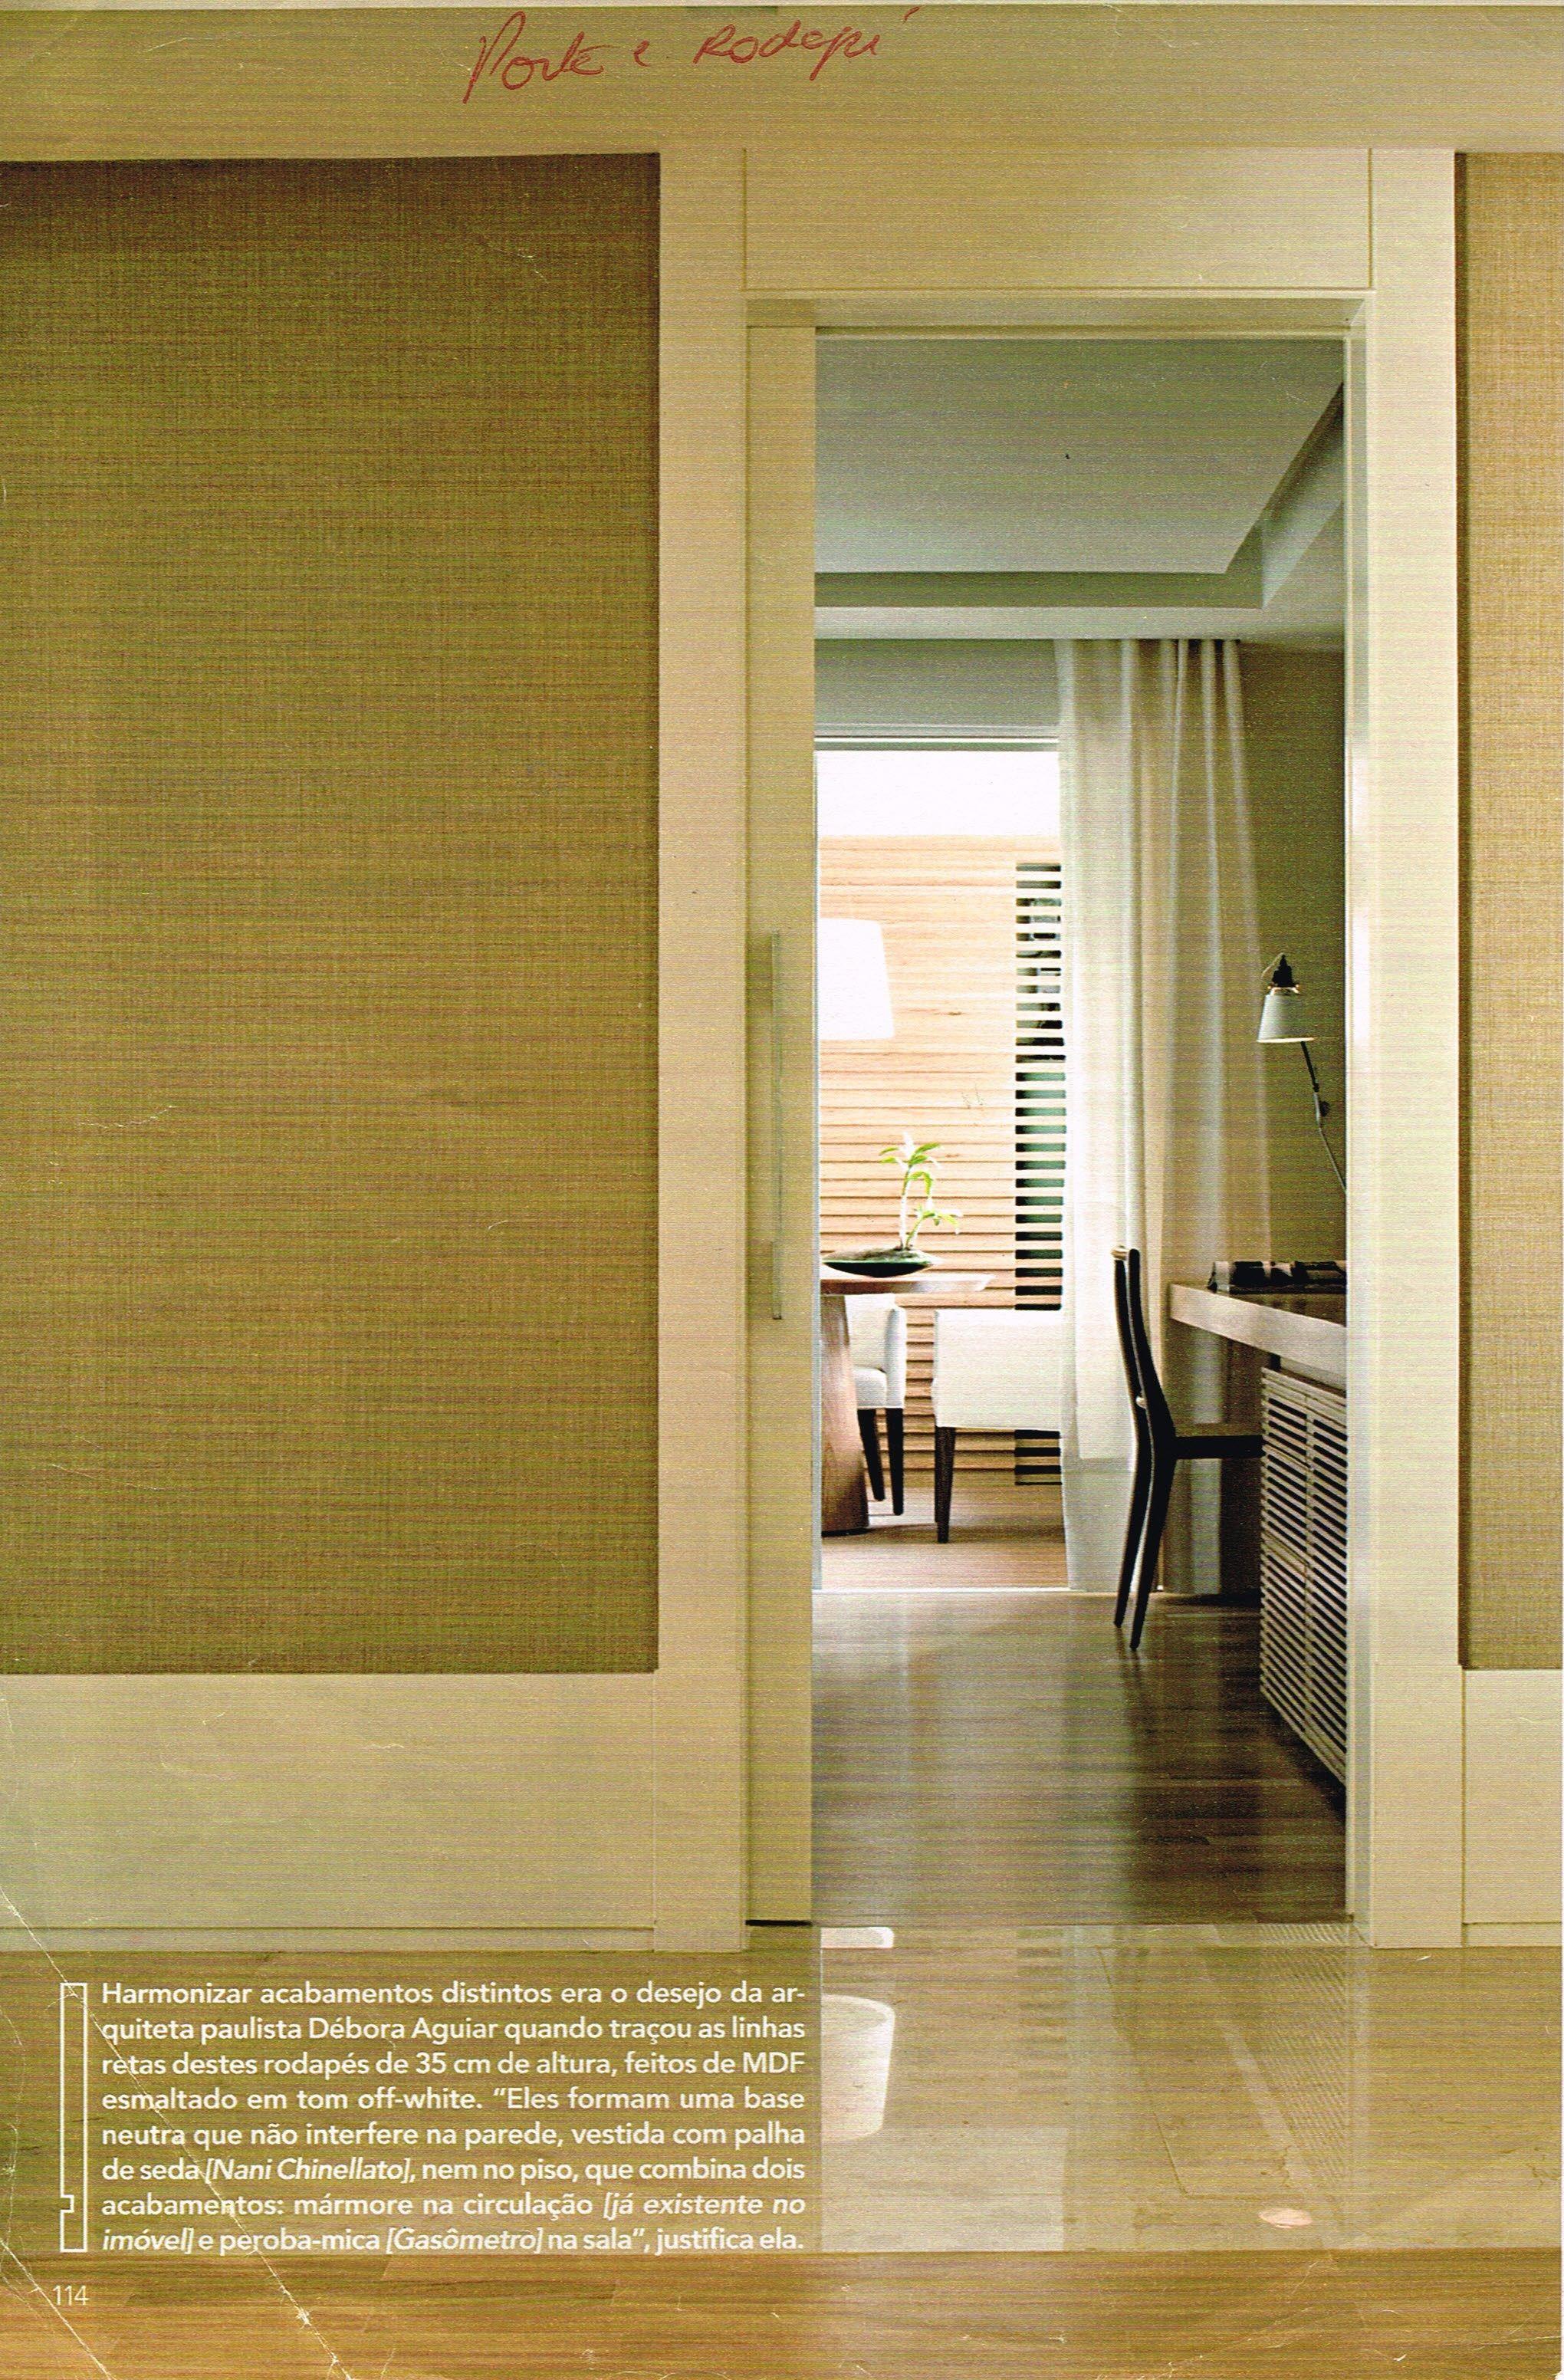 Porta e rodap alto mesmo material bandeira esquadrias - Papel pared entrada ...